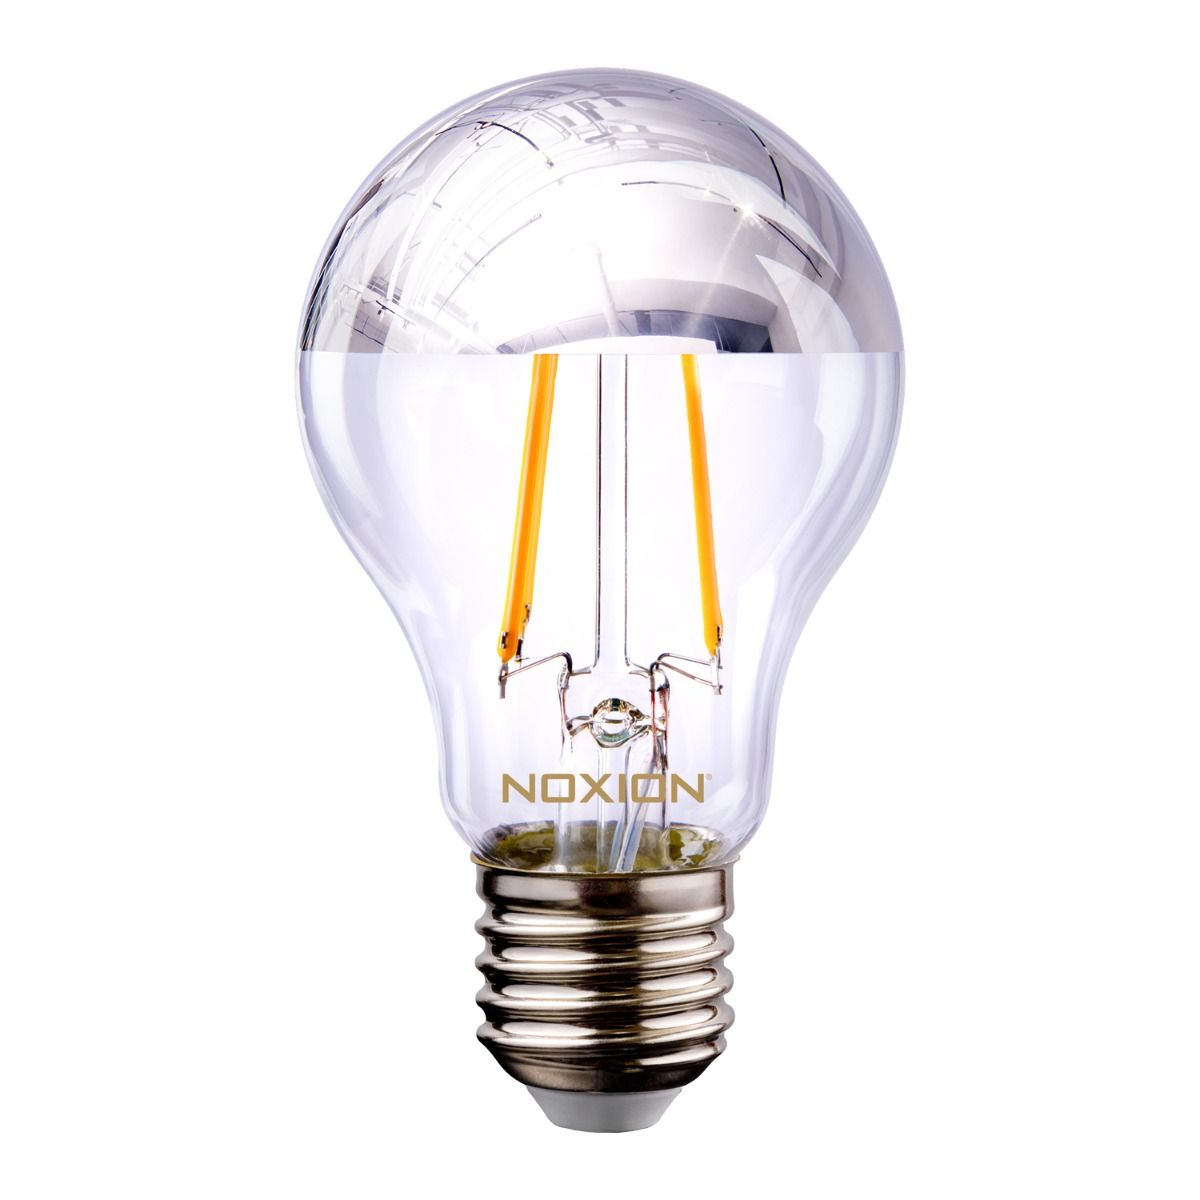 Noxion Lucent Fadenlampe LED Bulb Silber Spiegel A60 E27 220-240V 7W 680LM CRI80 2700K ND (60W eqv.)